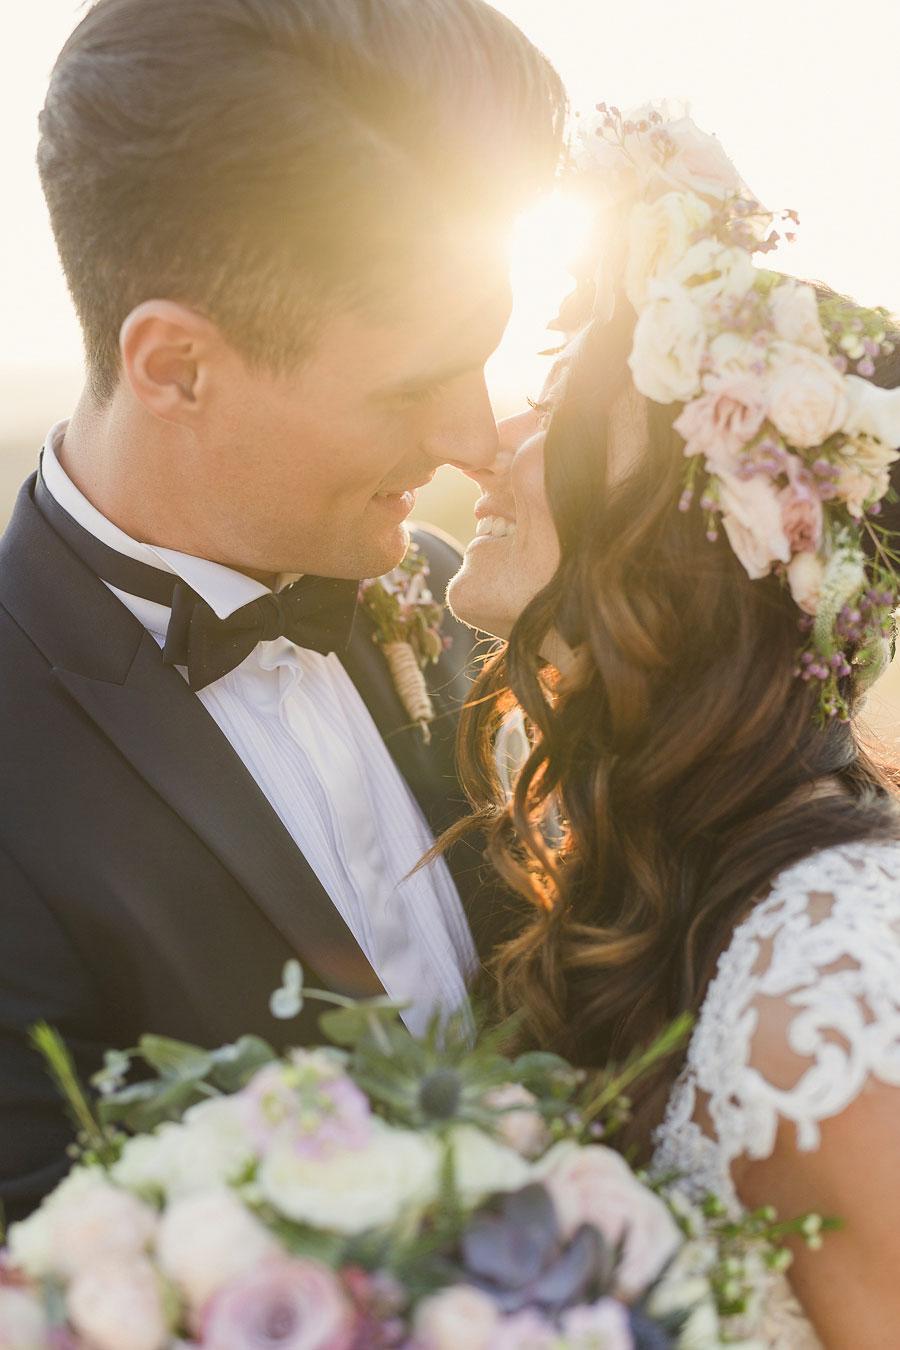 Wedding-Nicholad-and-Federica-Giuseppe-Giovannelli-207